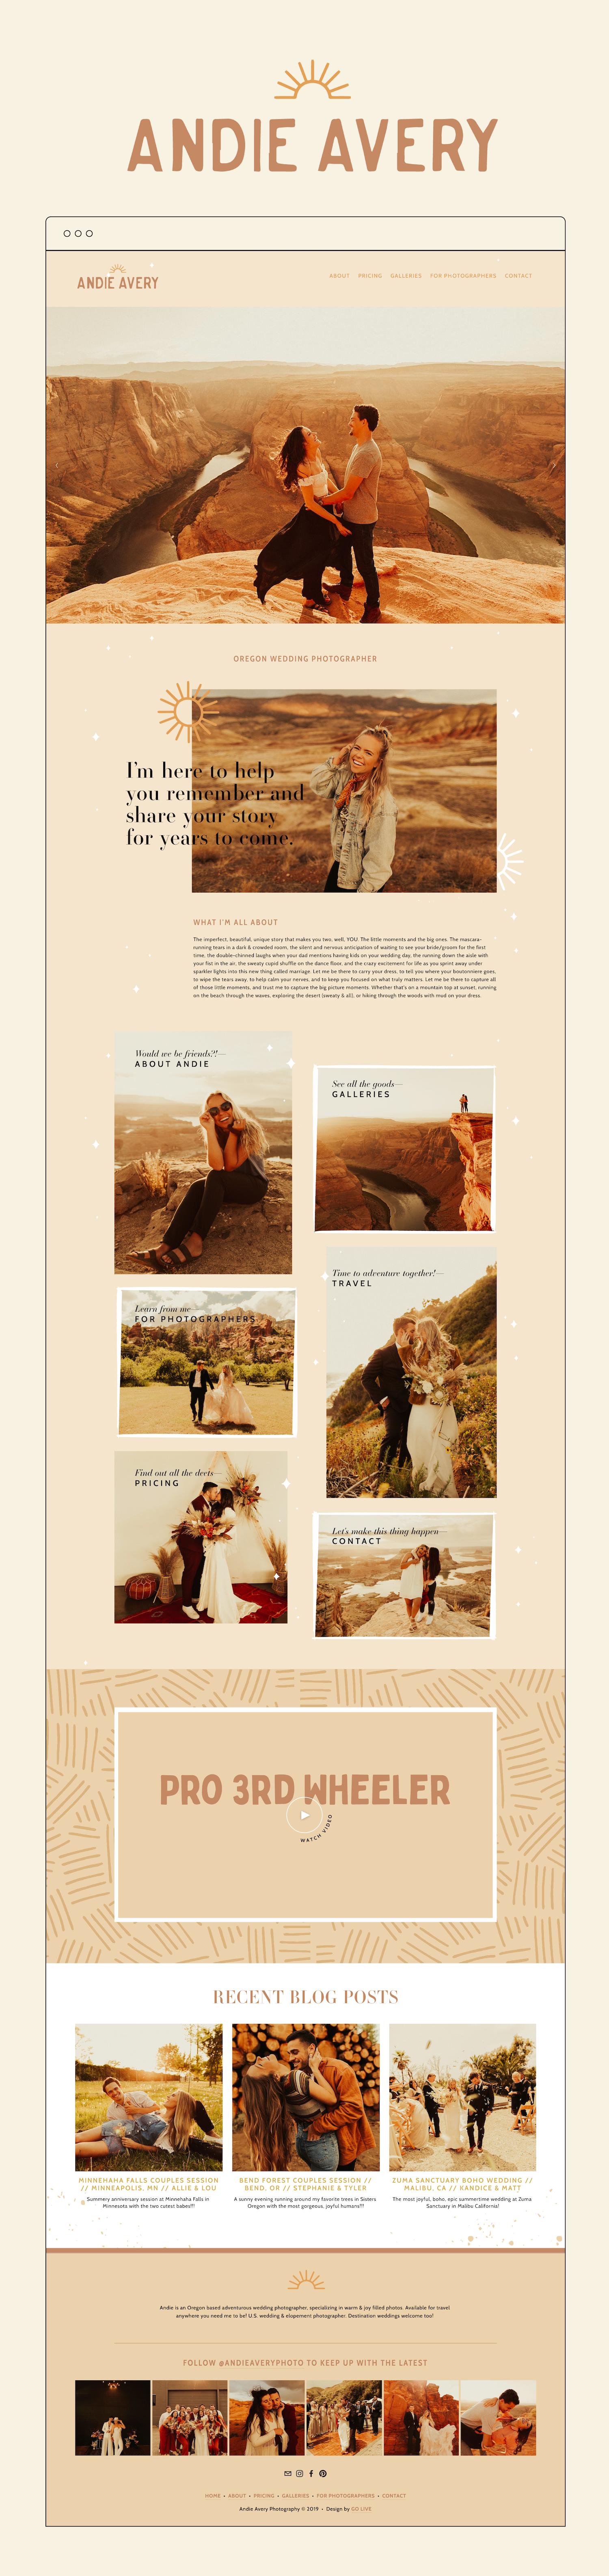 Desert Inspired Wedding Photography Squarespace Website Design | By GoLive Websites For Female Entrepreneurs